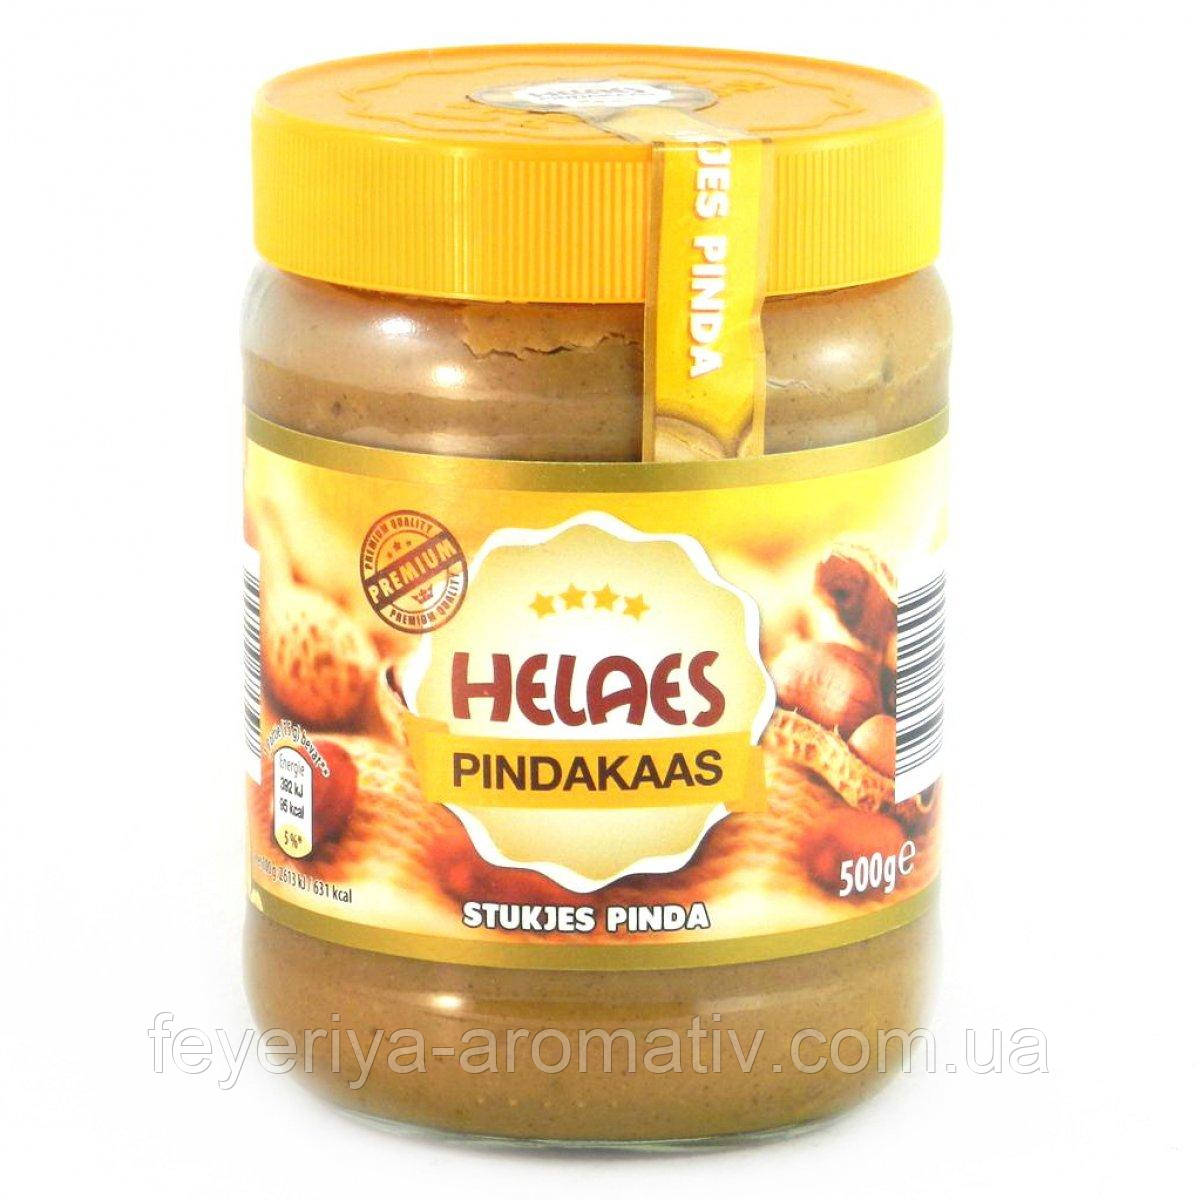 Арахисовое масло Helaes Pindakaas stukjes pinda, 500гр (Голандия)